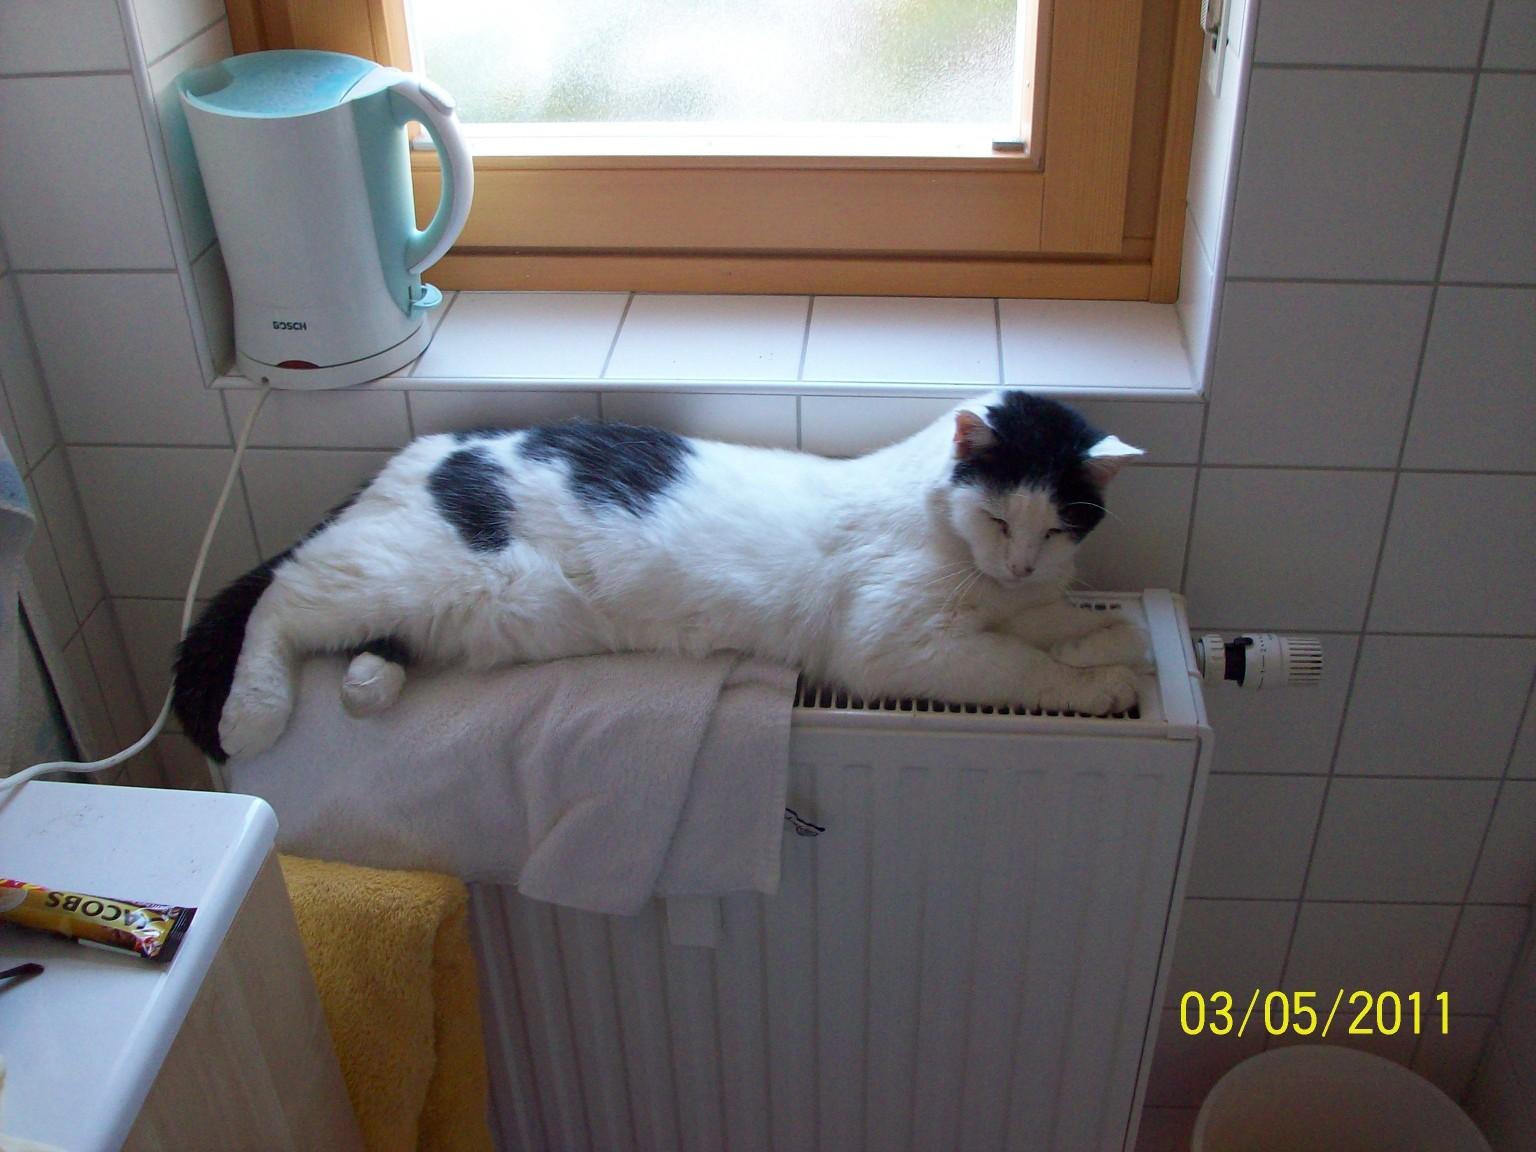 Murly keeps himself warm